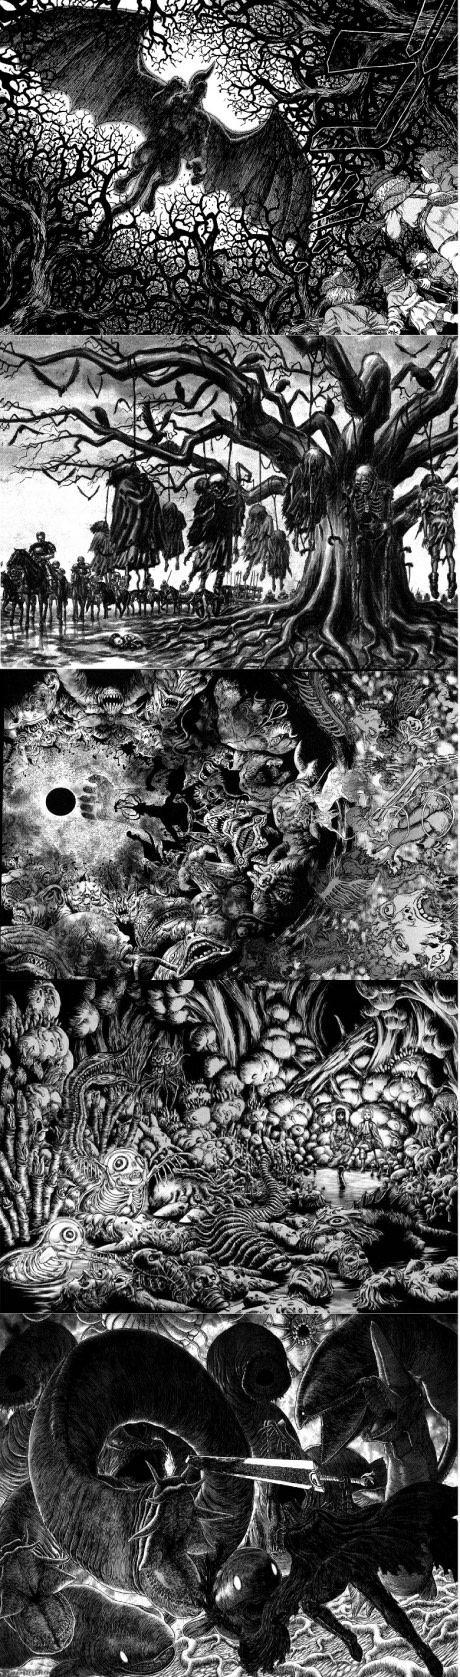 Artwork from Kentaro Miura for Berserk. Simply beautiful